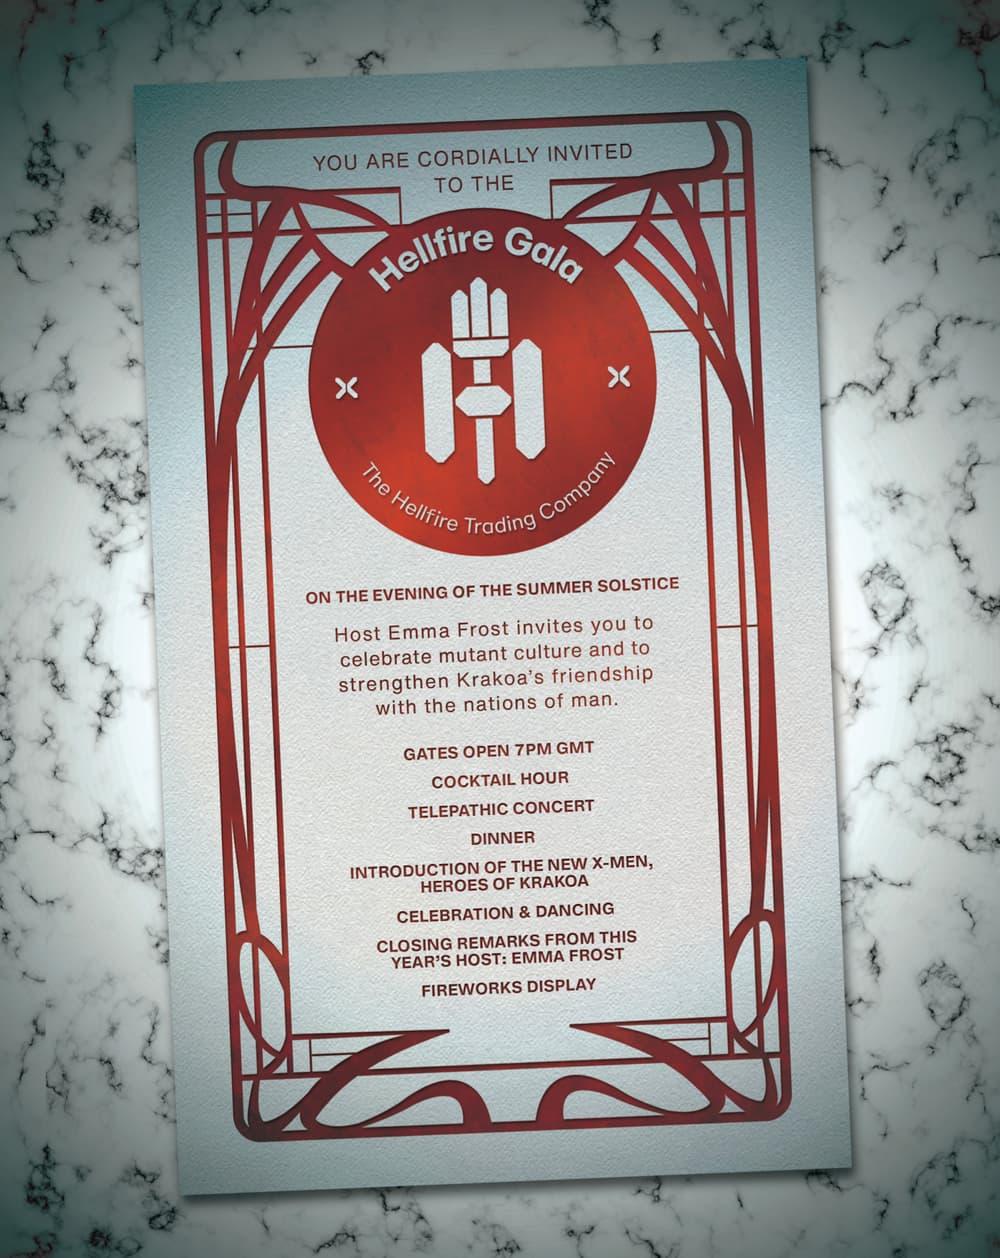 Hellfire Gala invite